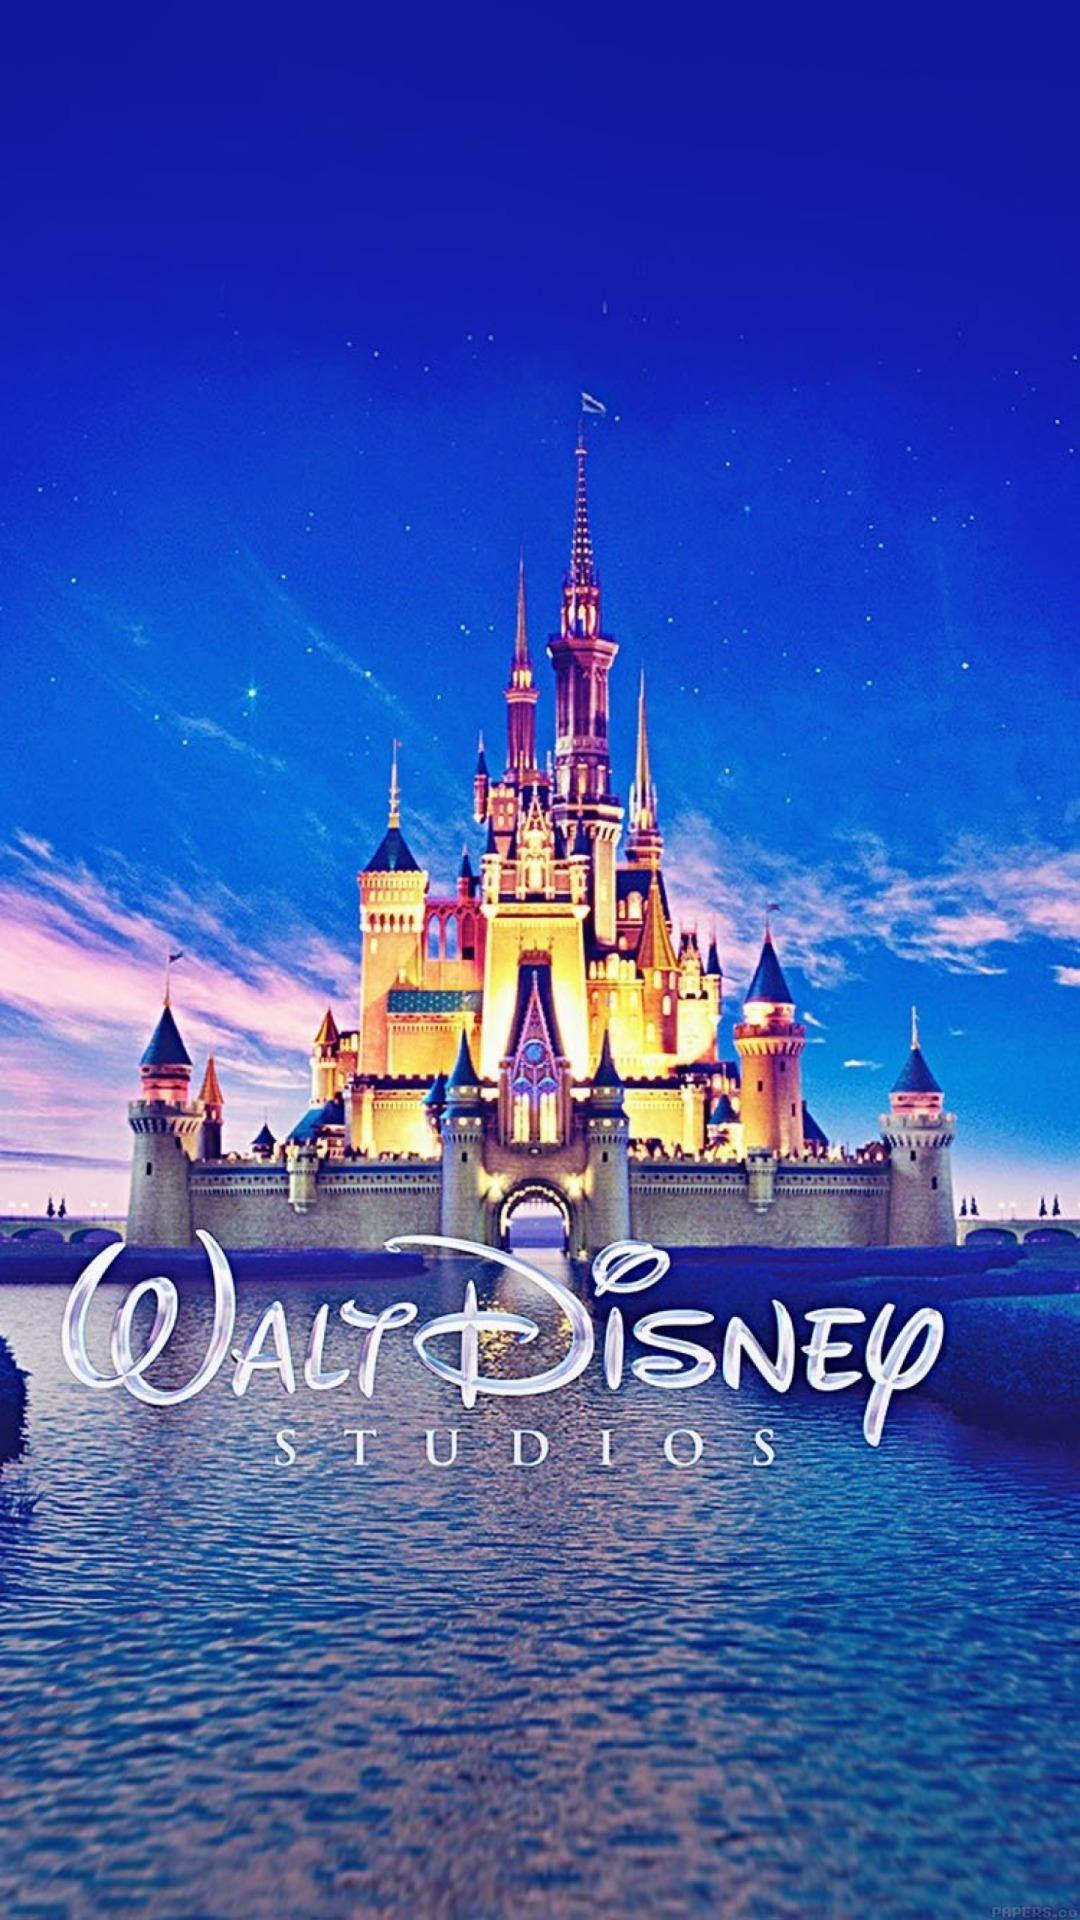 70 Disneyland Castle Wallpapers On Wallpaperplay Wallpaper Iphone Disney Disney Wallpaper Walt Disney Castle